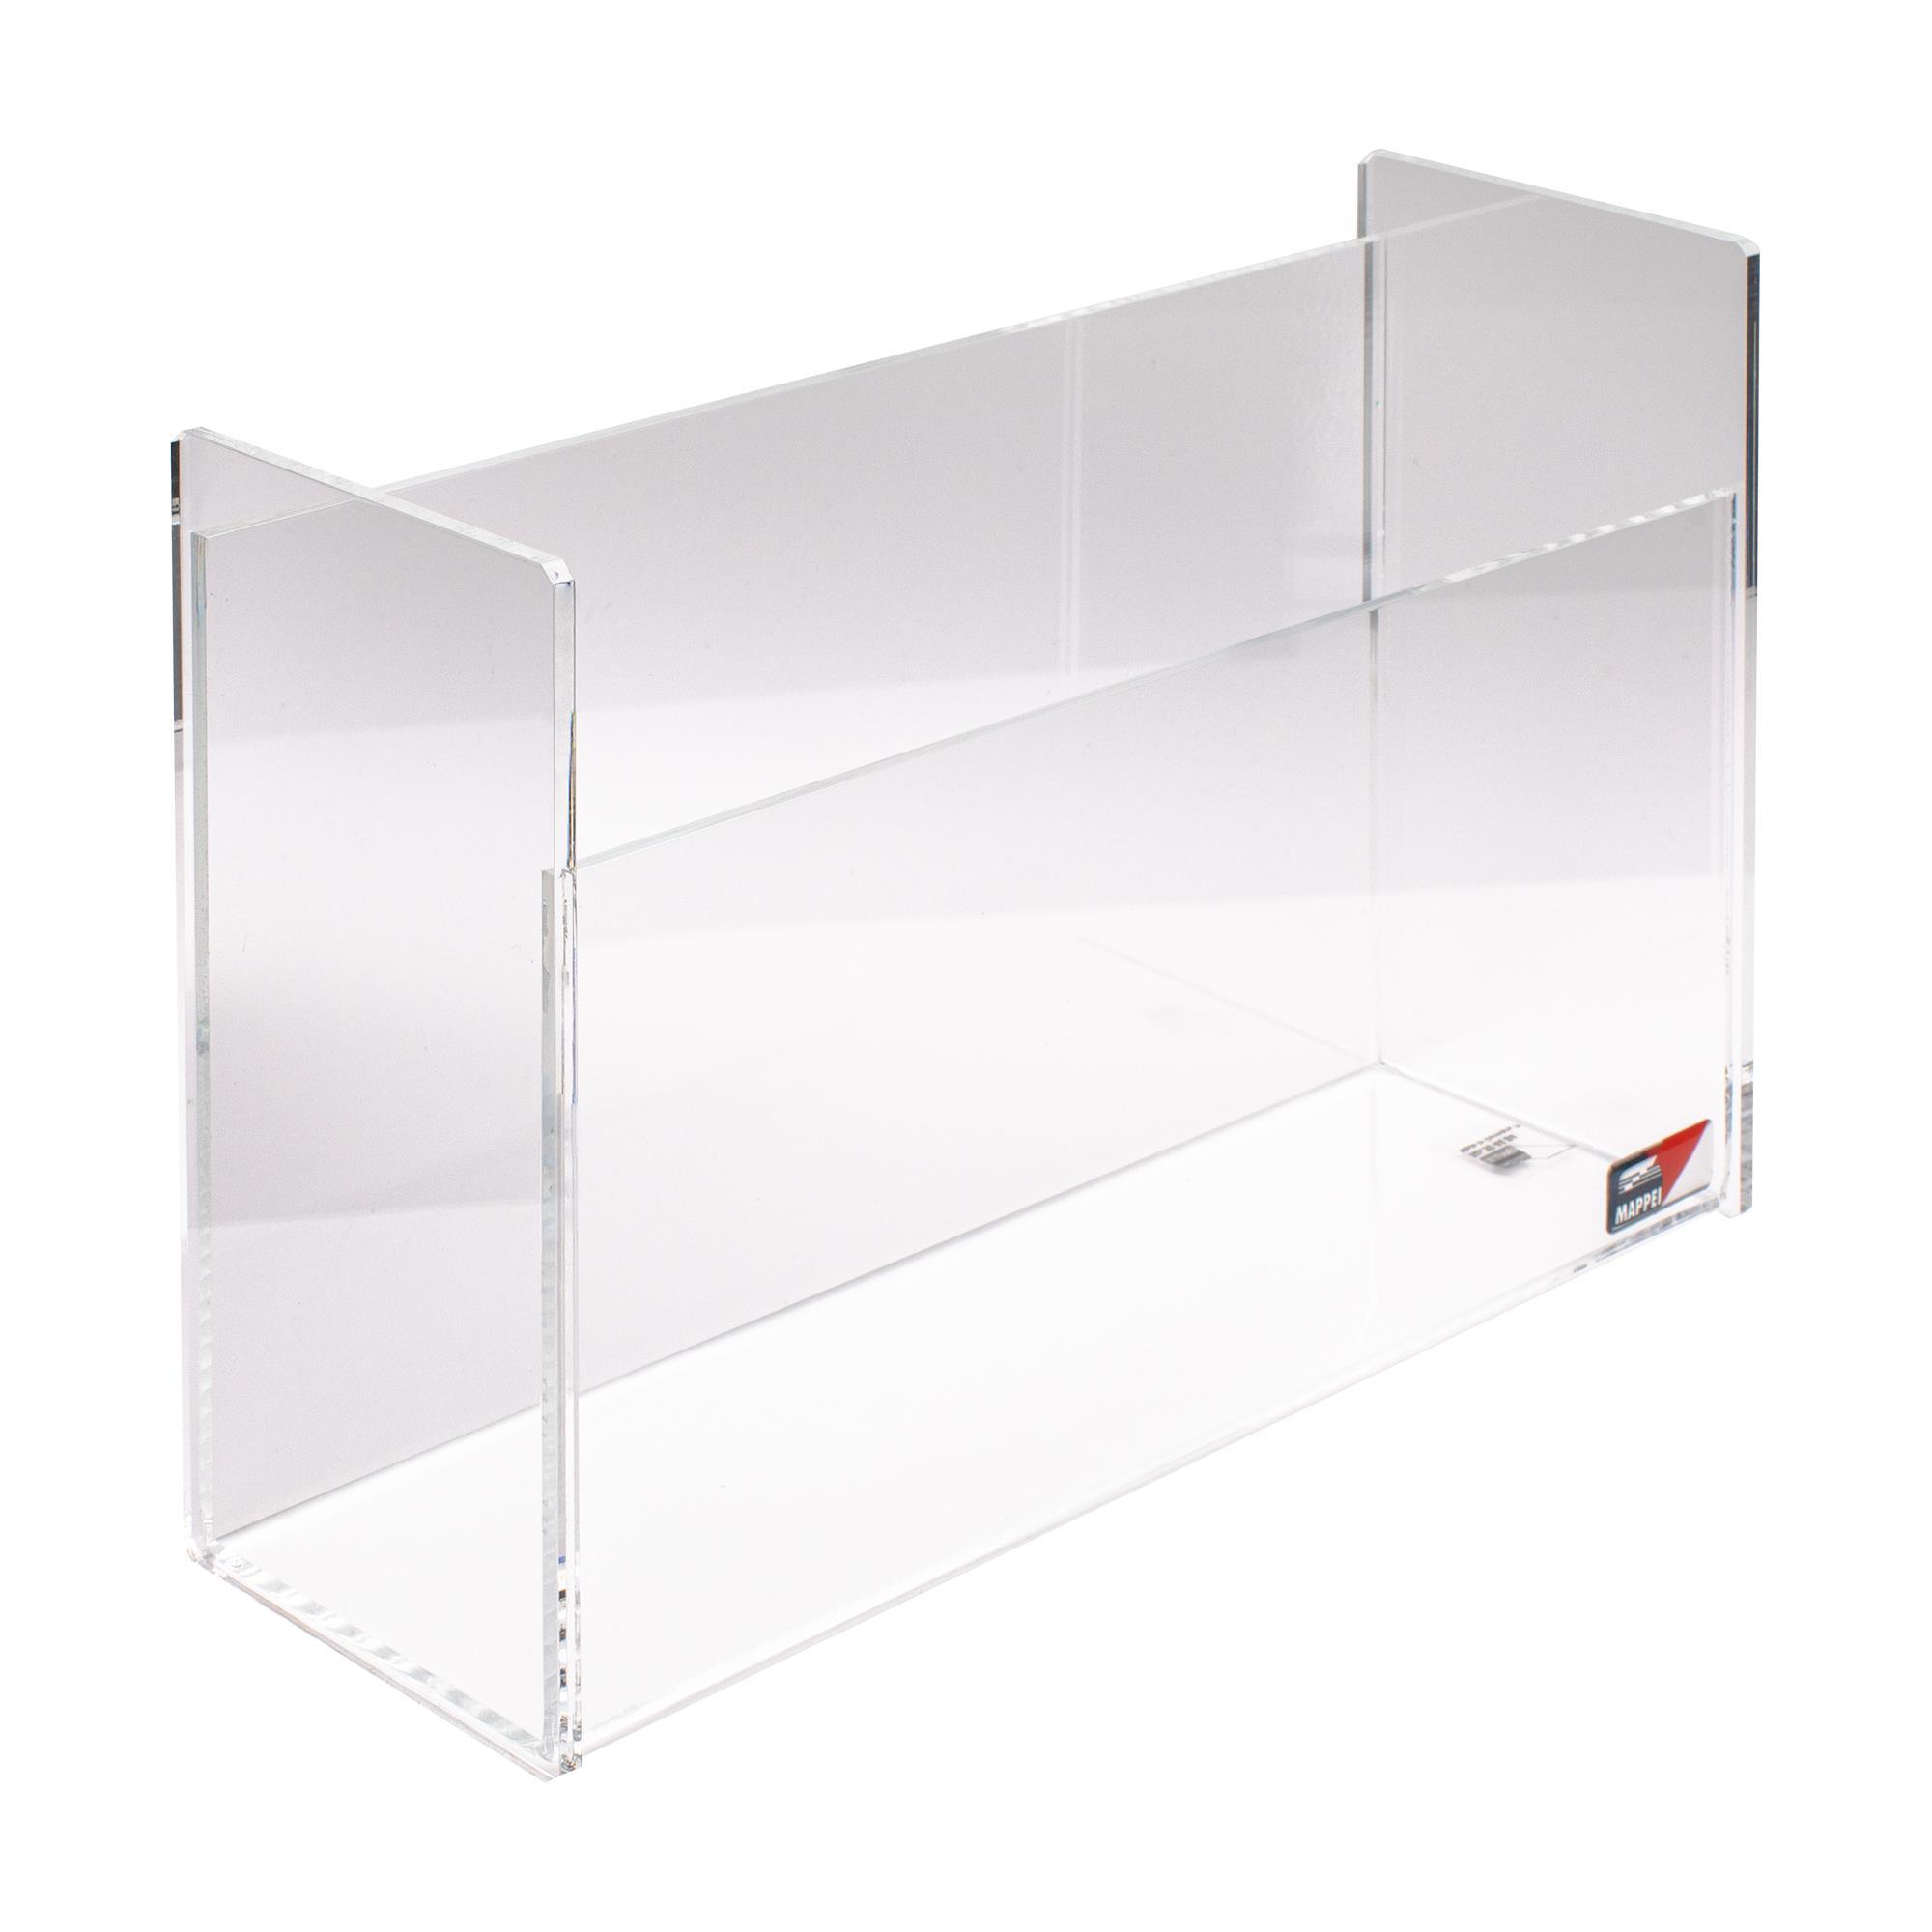 Ordnungsbox für DIN A4, 10,5 cm tief, Acrylglas, klar